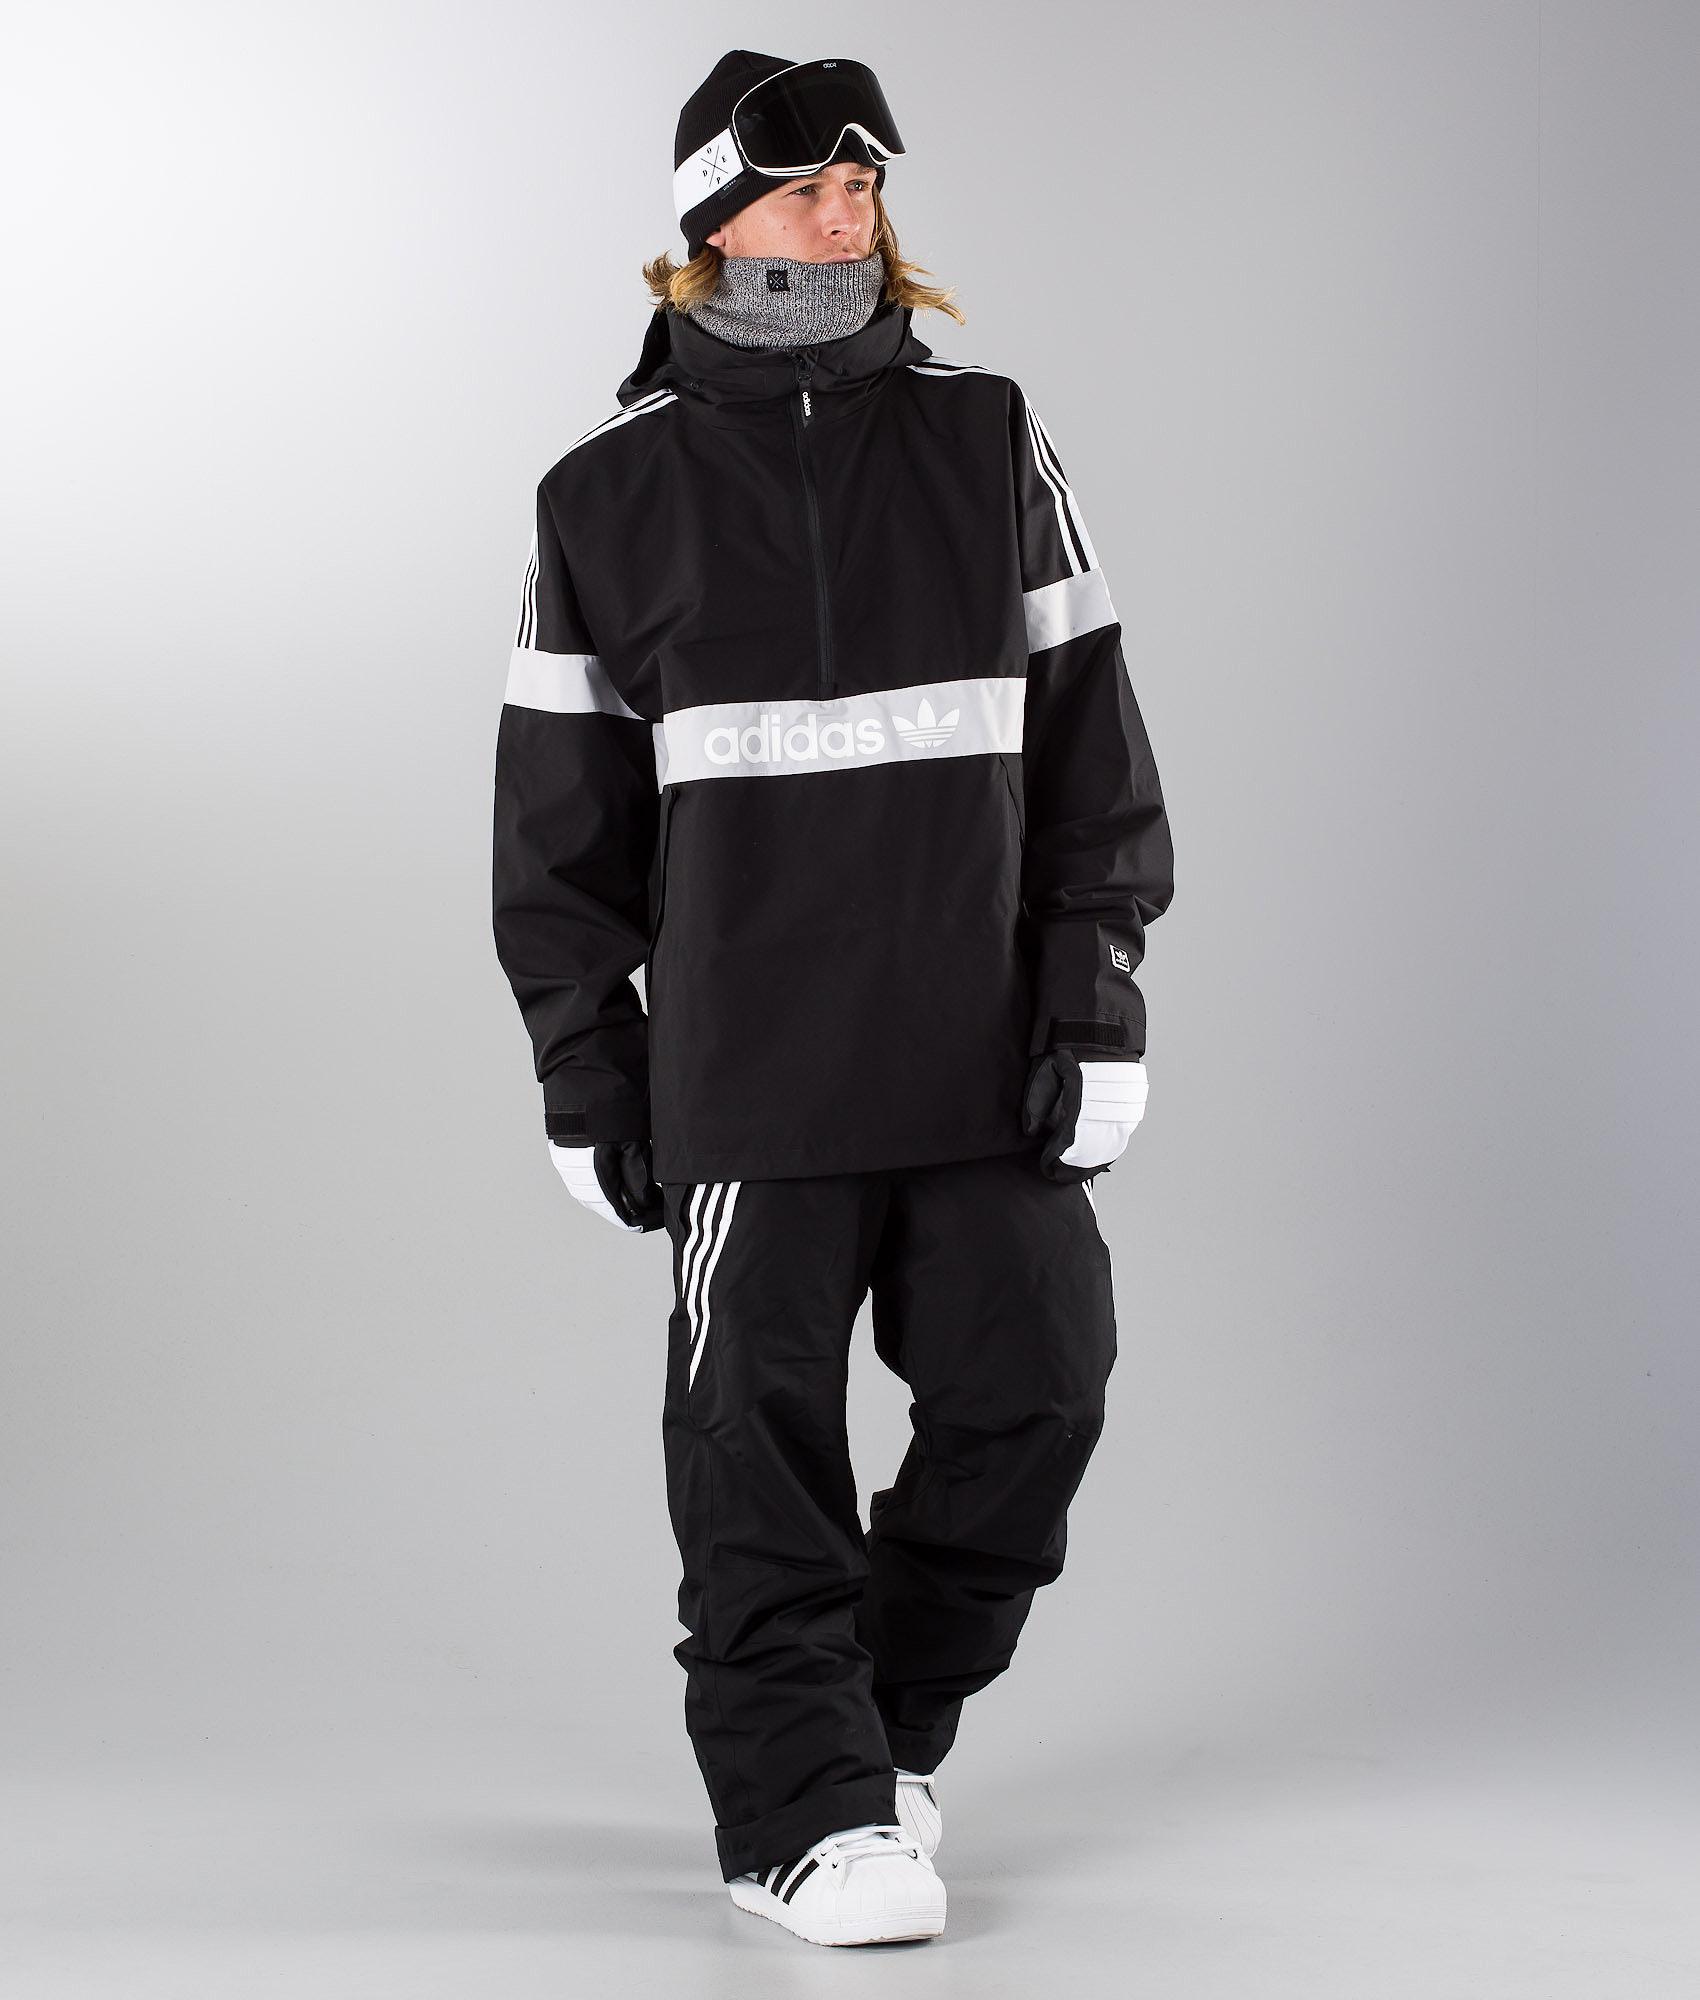 Adidas Snowboarding Blackbird Snowboardjacke Black Lgsogr White ... 7990b5e49b